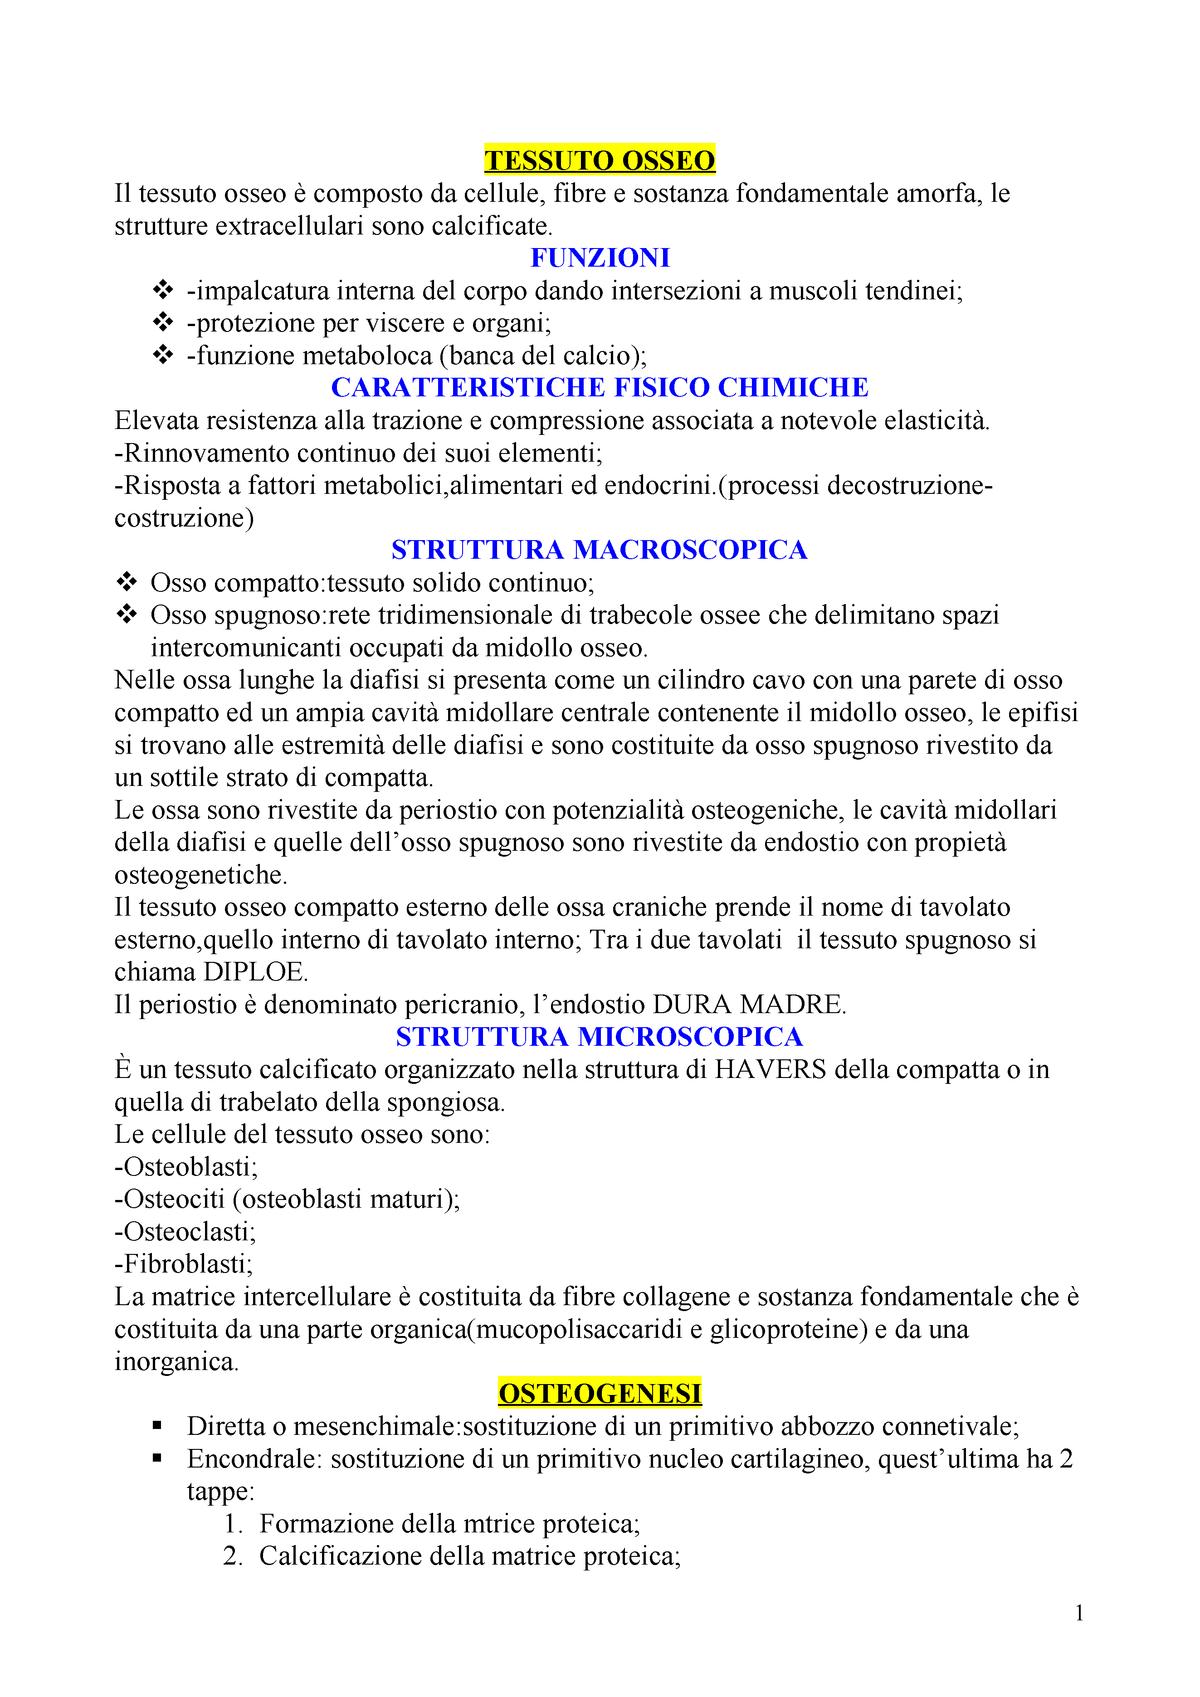 Reumatologia Uniba Studocu